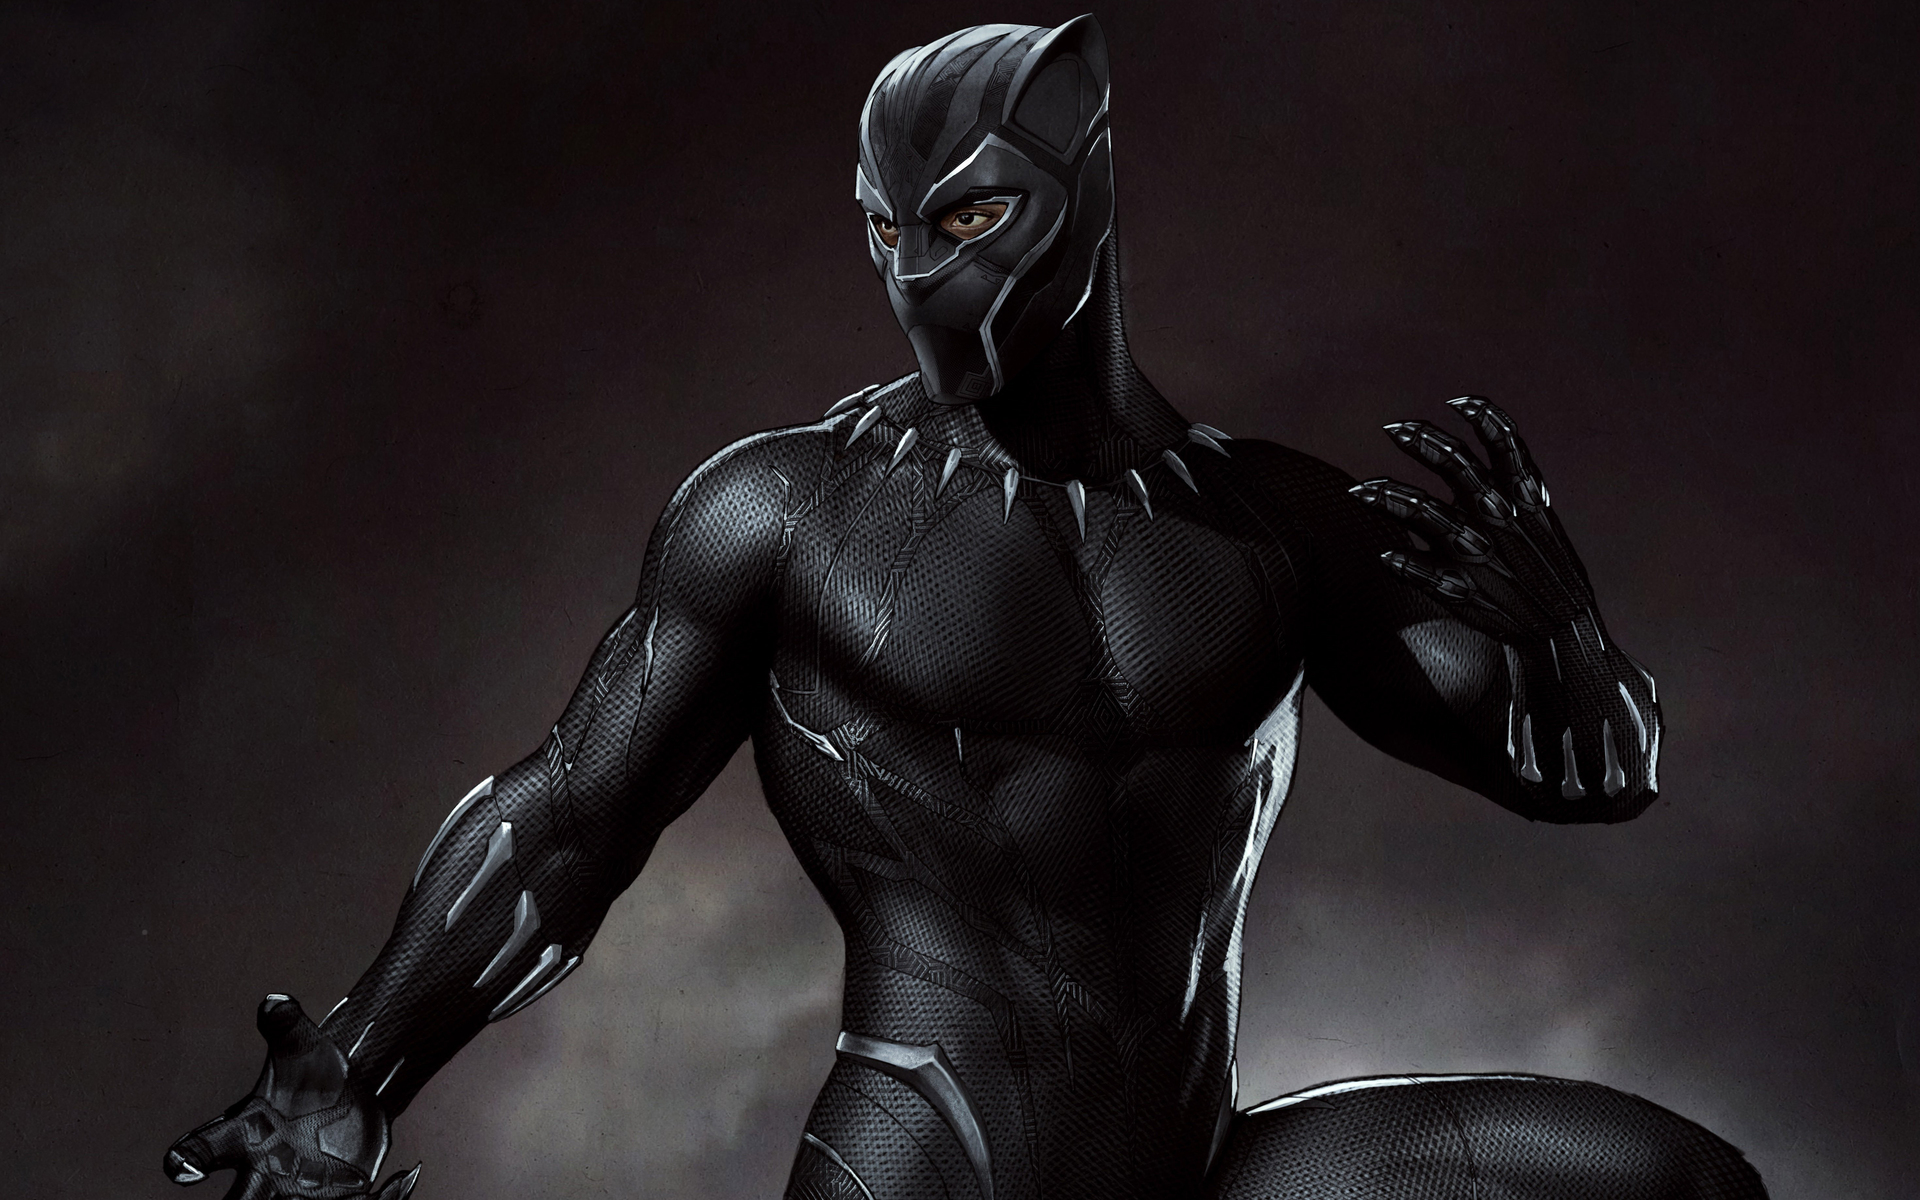 1920x1200 Black Panther 5k Artwork 1080P Resolution HD 4k ...